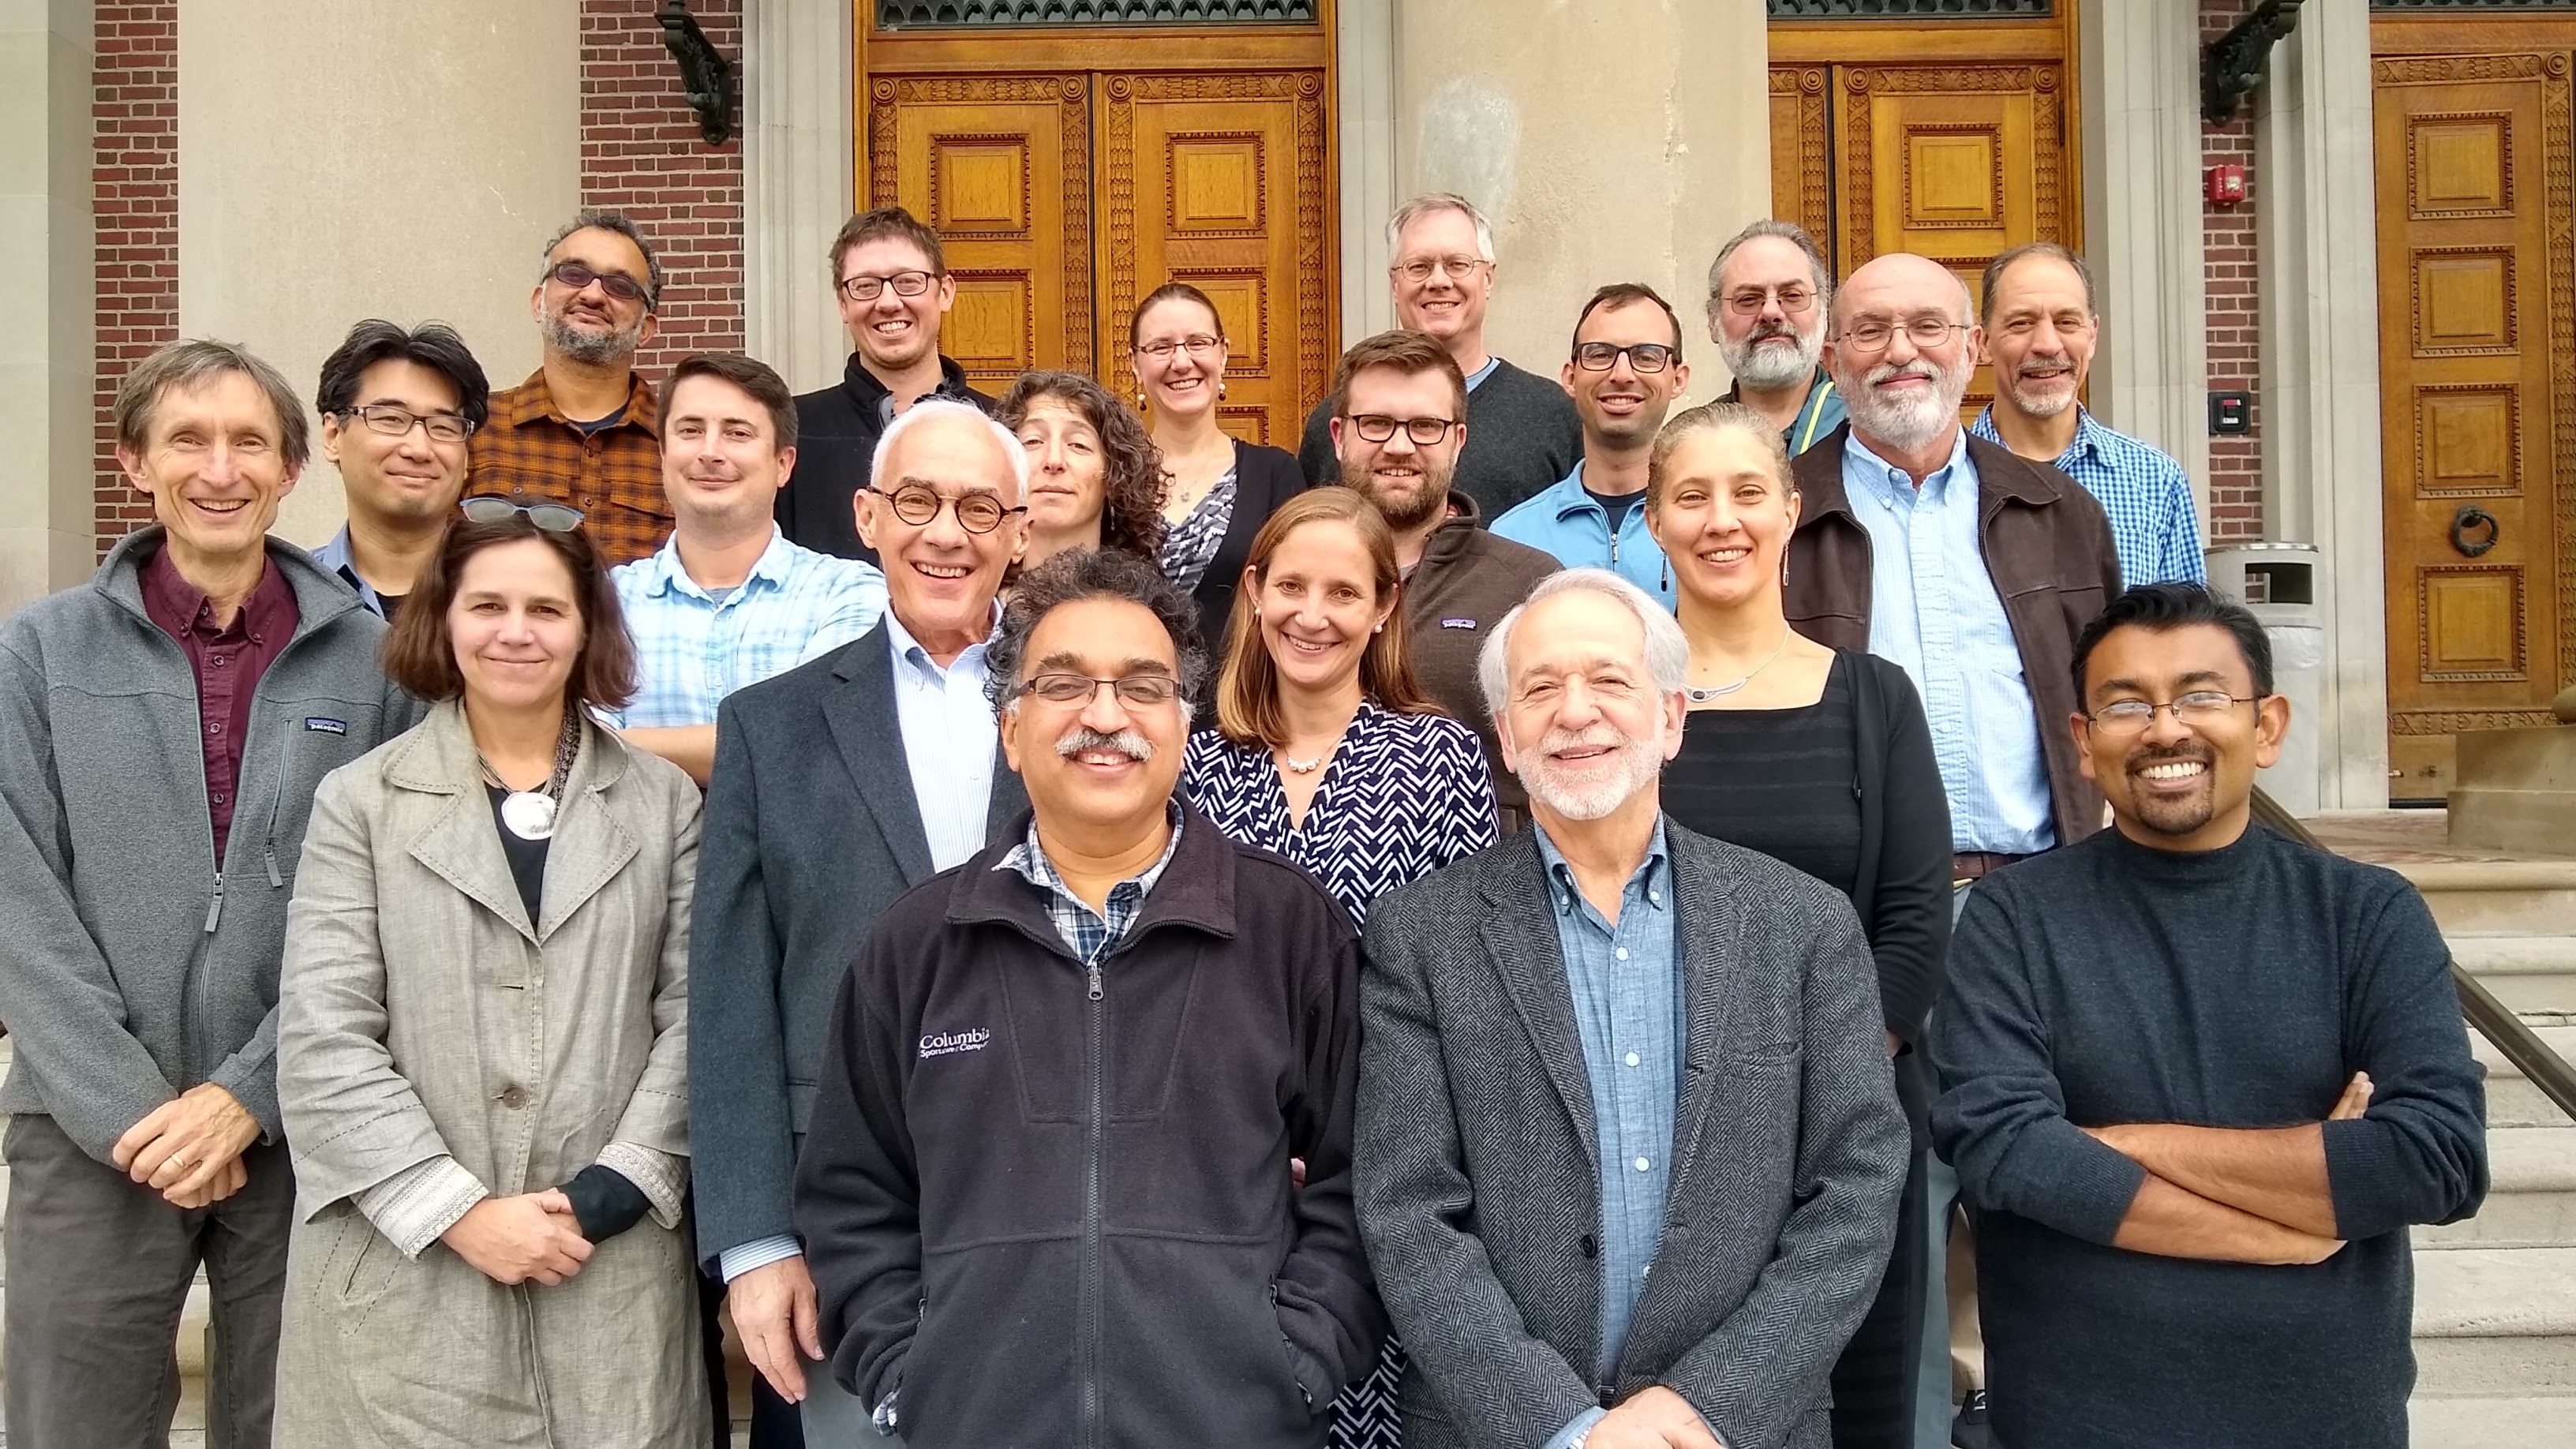 Group photo of economics faculty